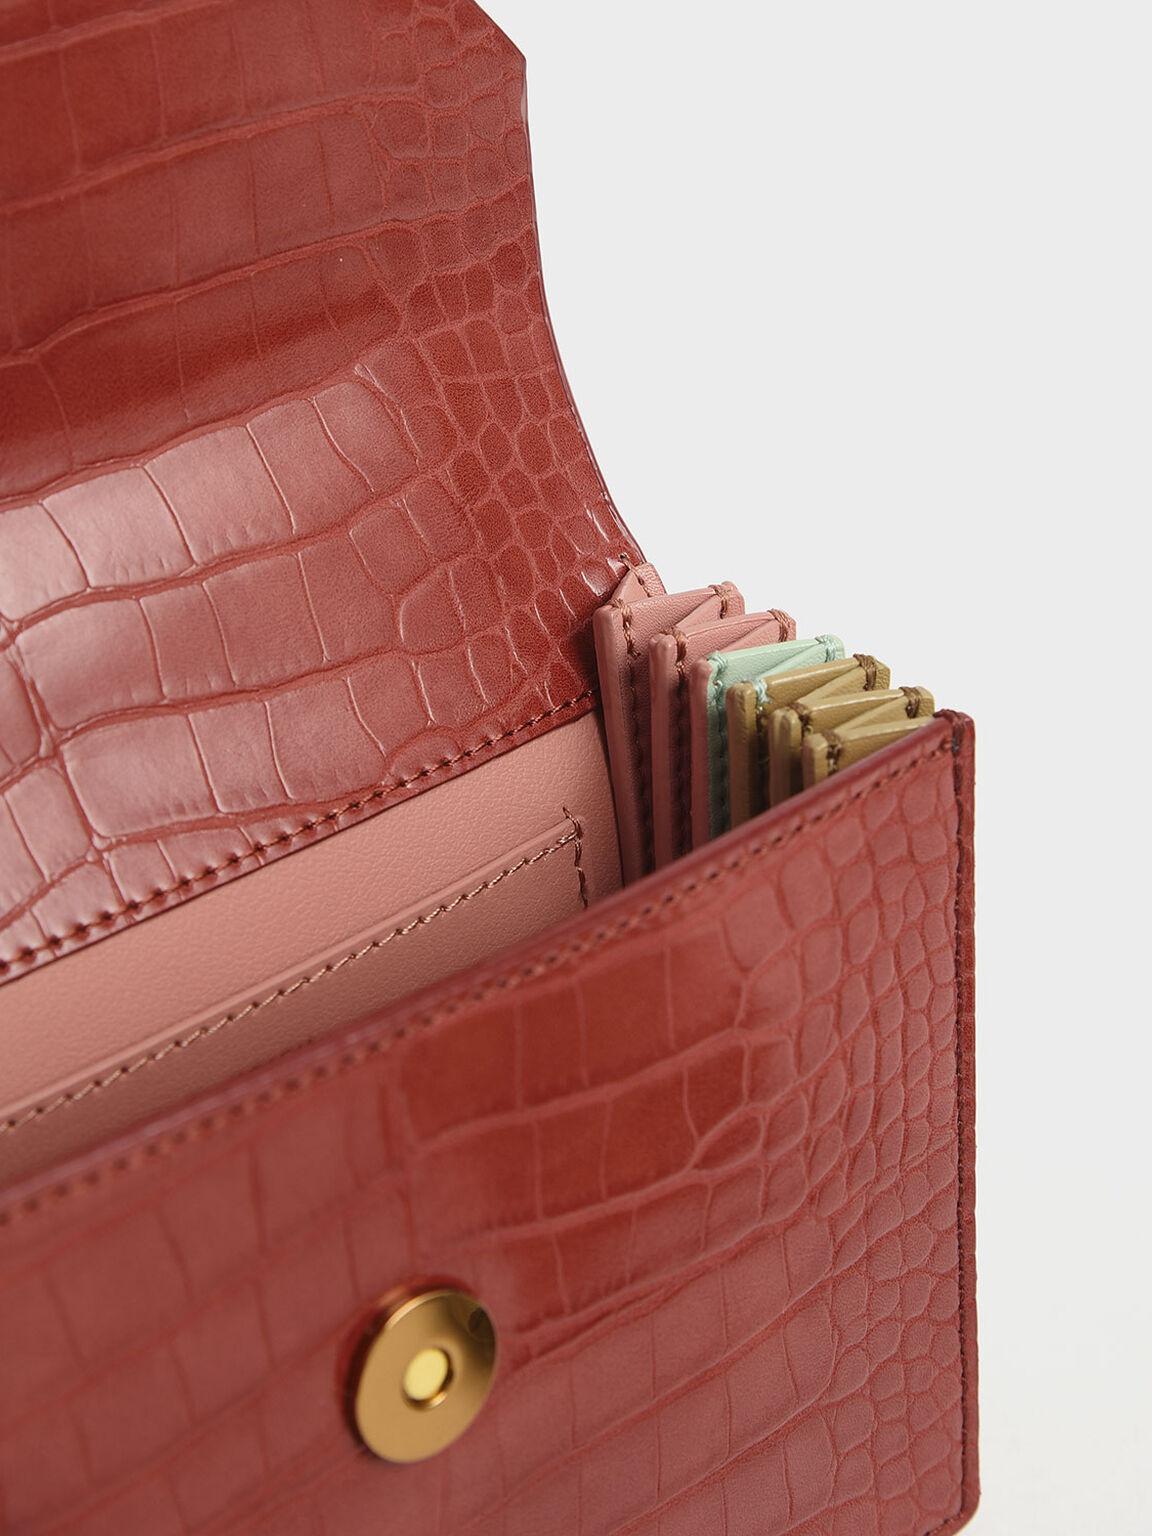 小型手風琴包, 土色, hi-res